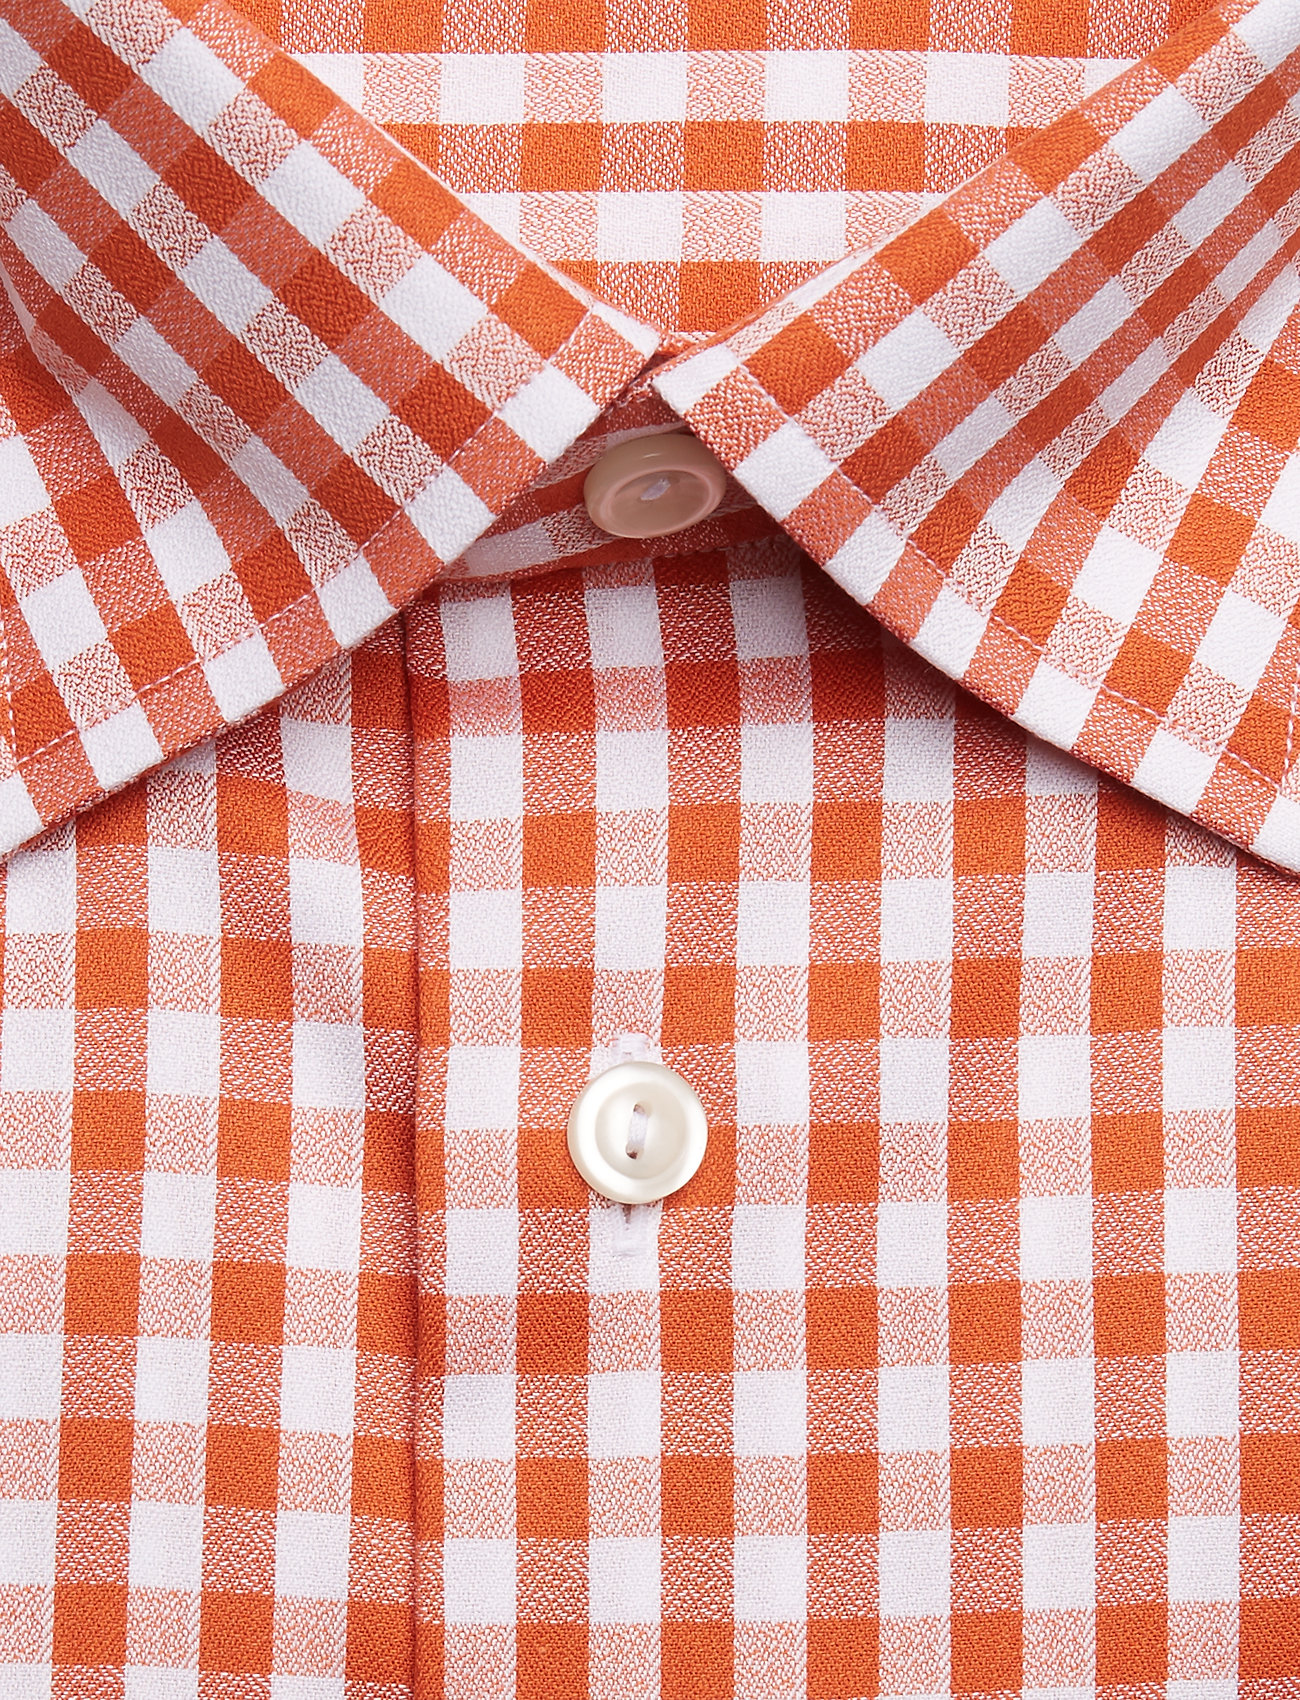 Shirtyellow Orange Gingham Gingham Orange Orange orangeEton Check orangeEton Check Gingham Shirtyellow pSUMqzV